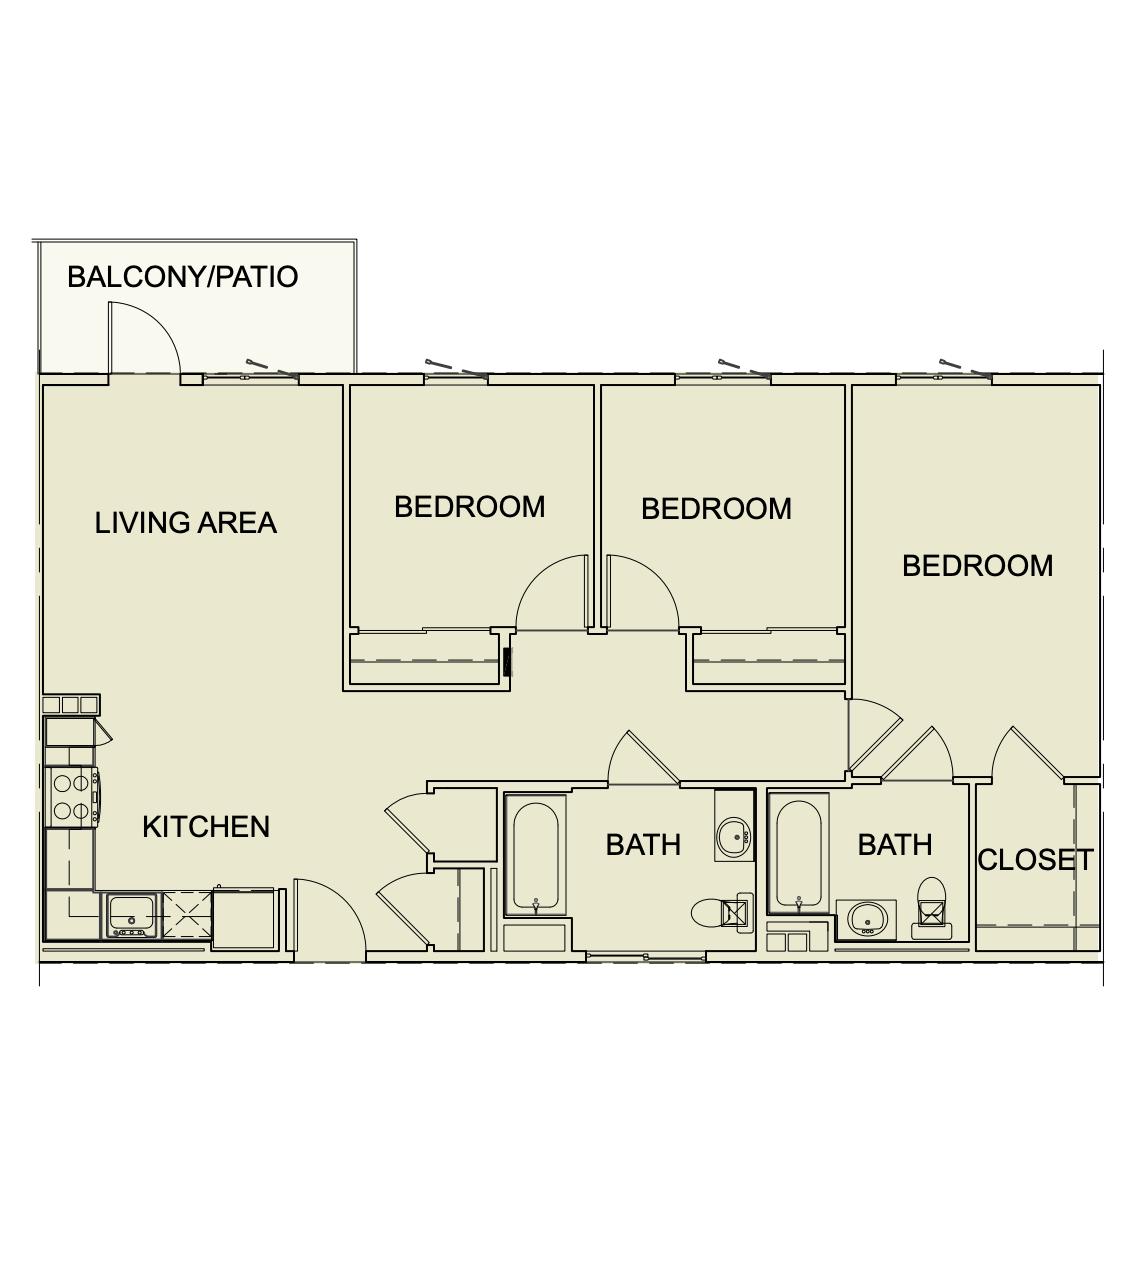 Three Bedroom/ Two Bath - 1087 SF unit type c1